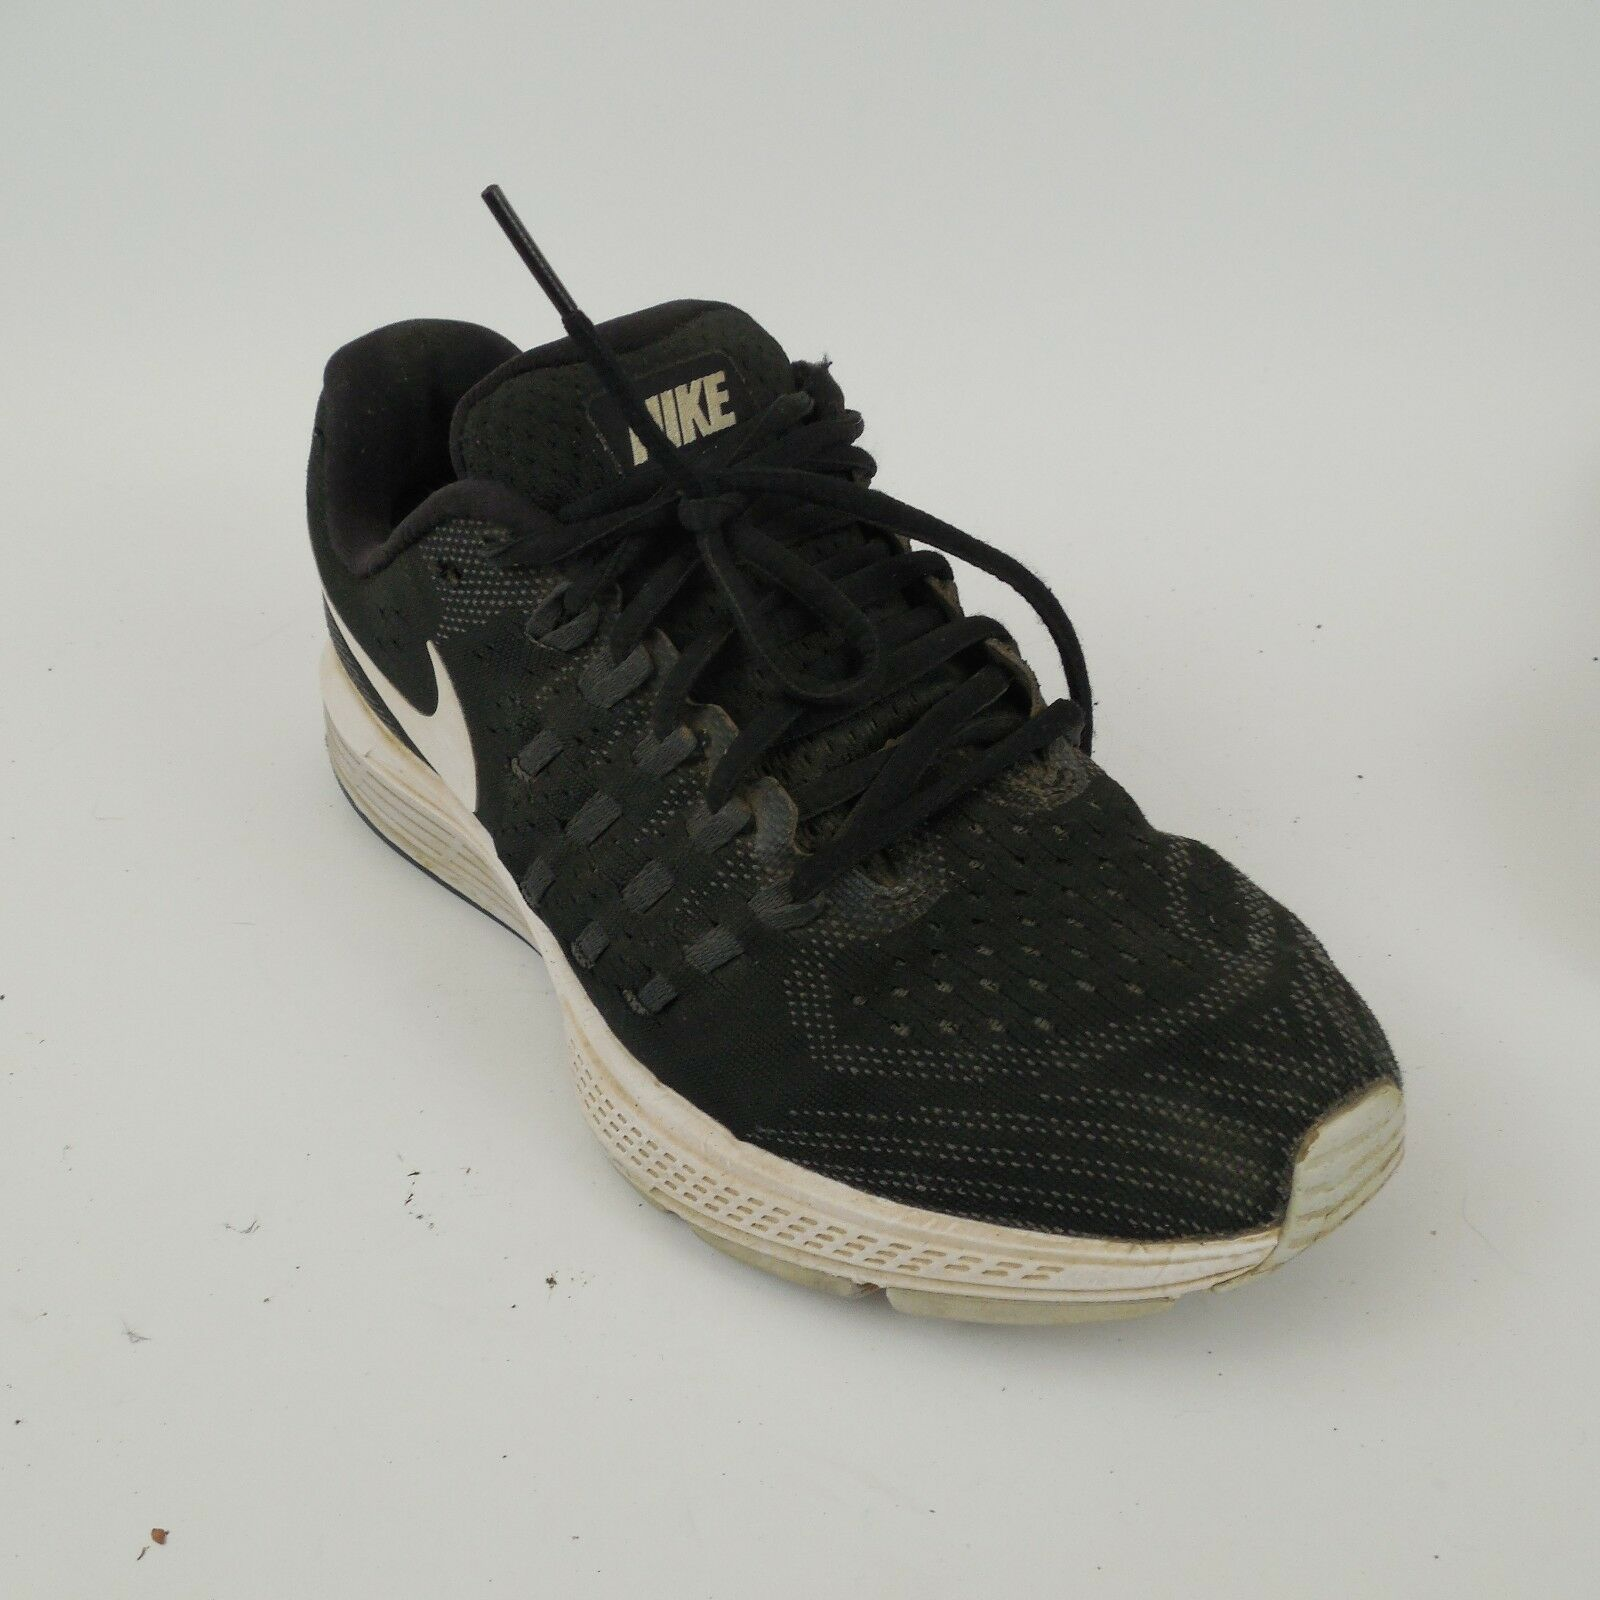 Womens Nike Air Zoom Vomero 11 Black/White 818100-001 sz 7 M No Insoles Sneakers